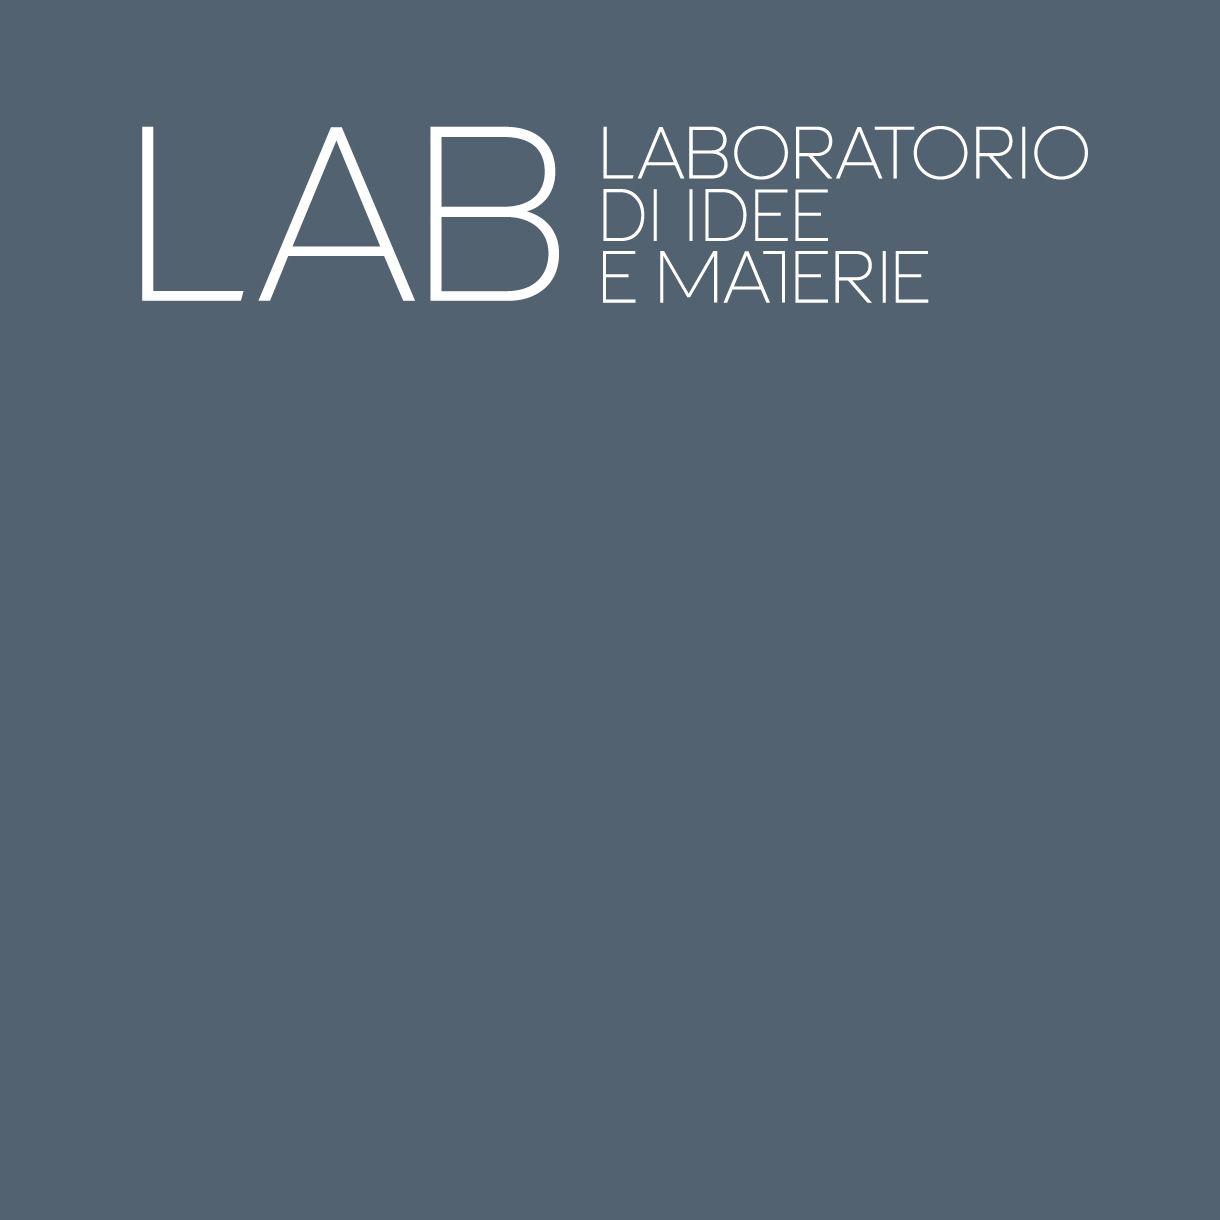 lab - log